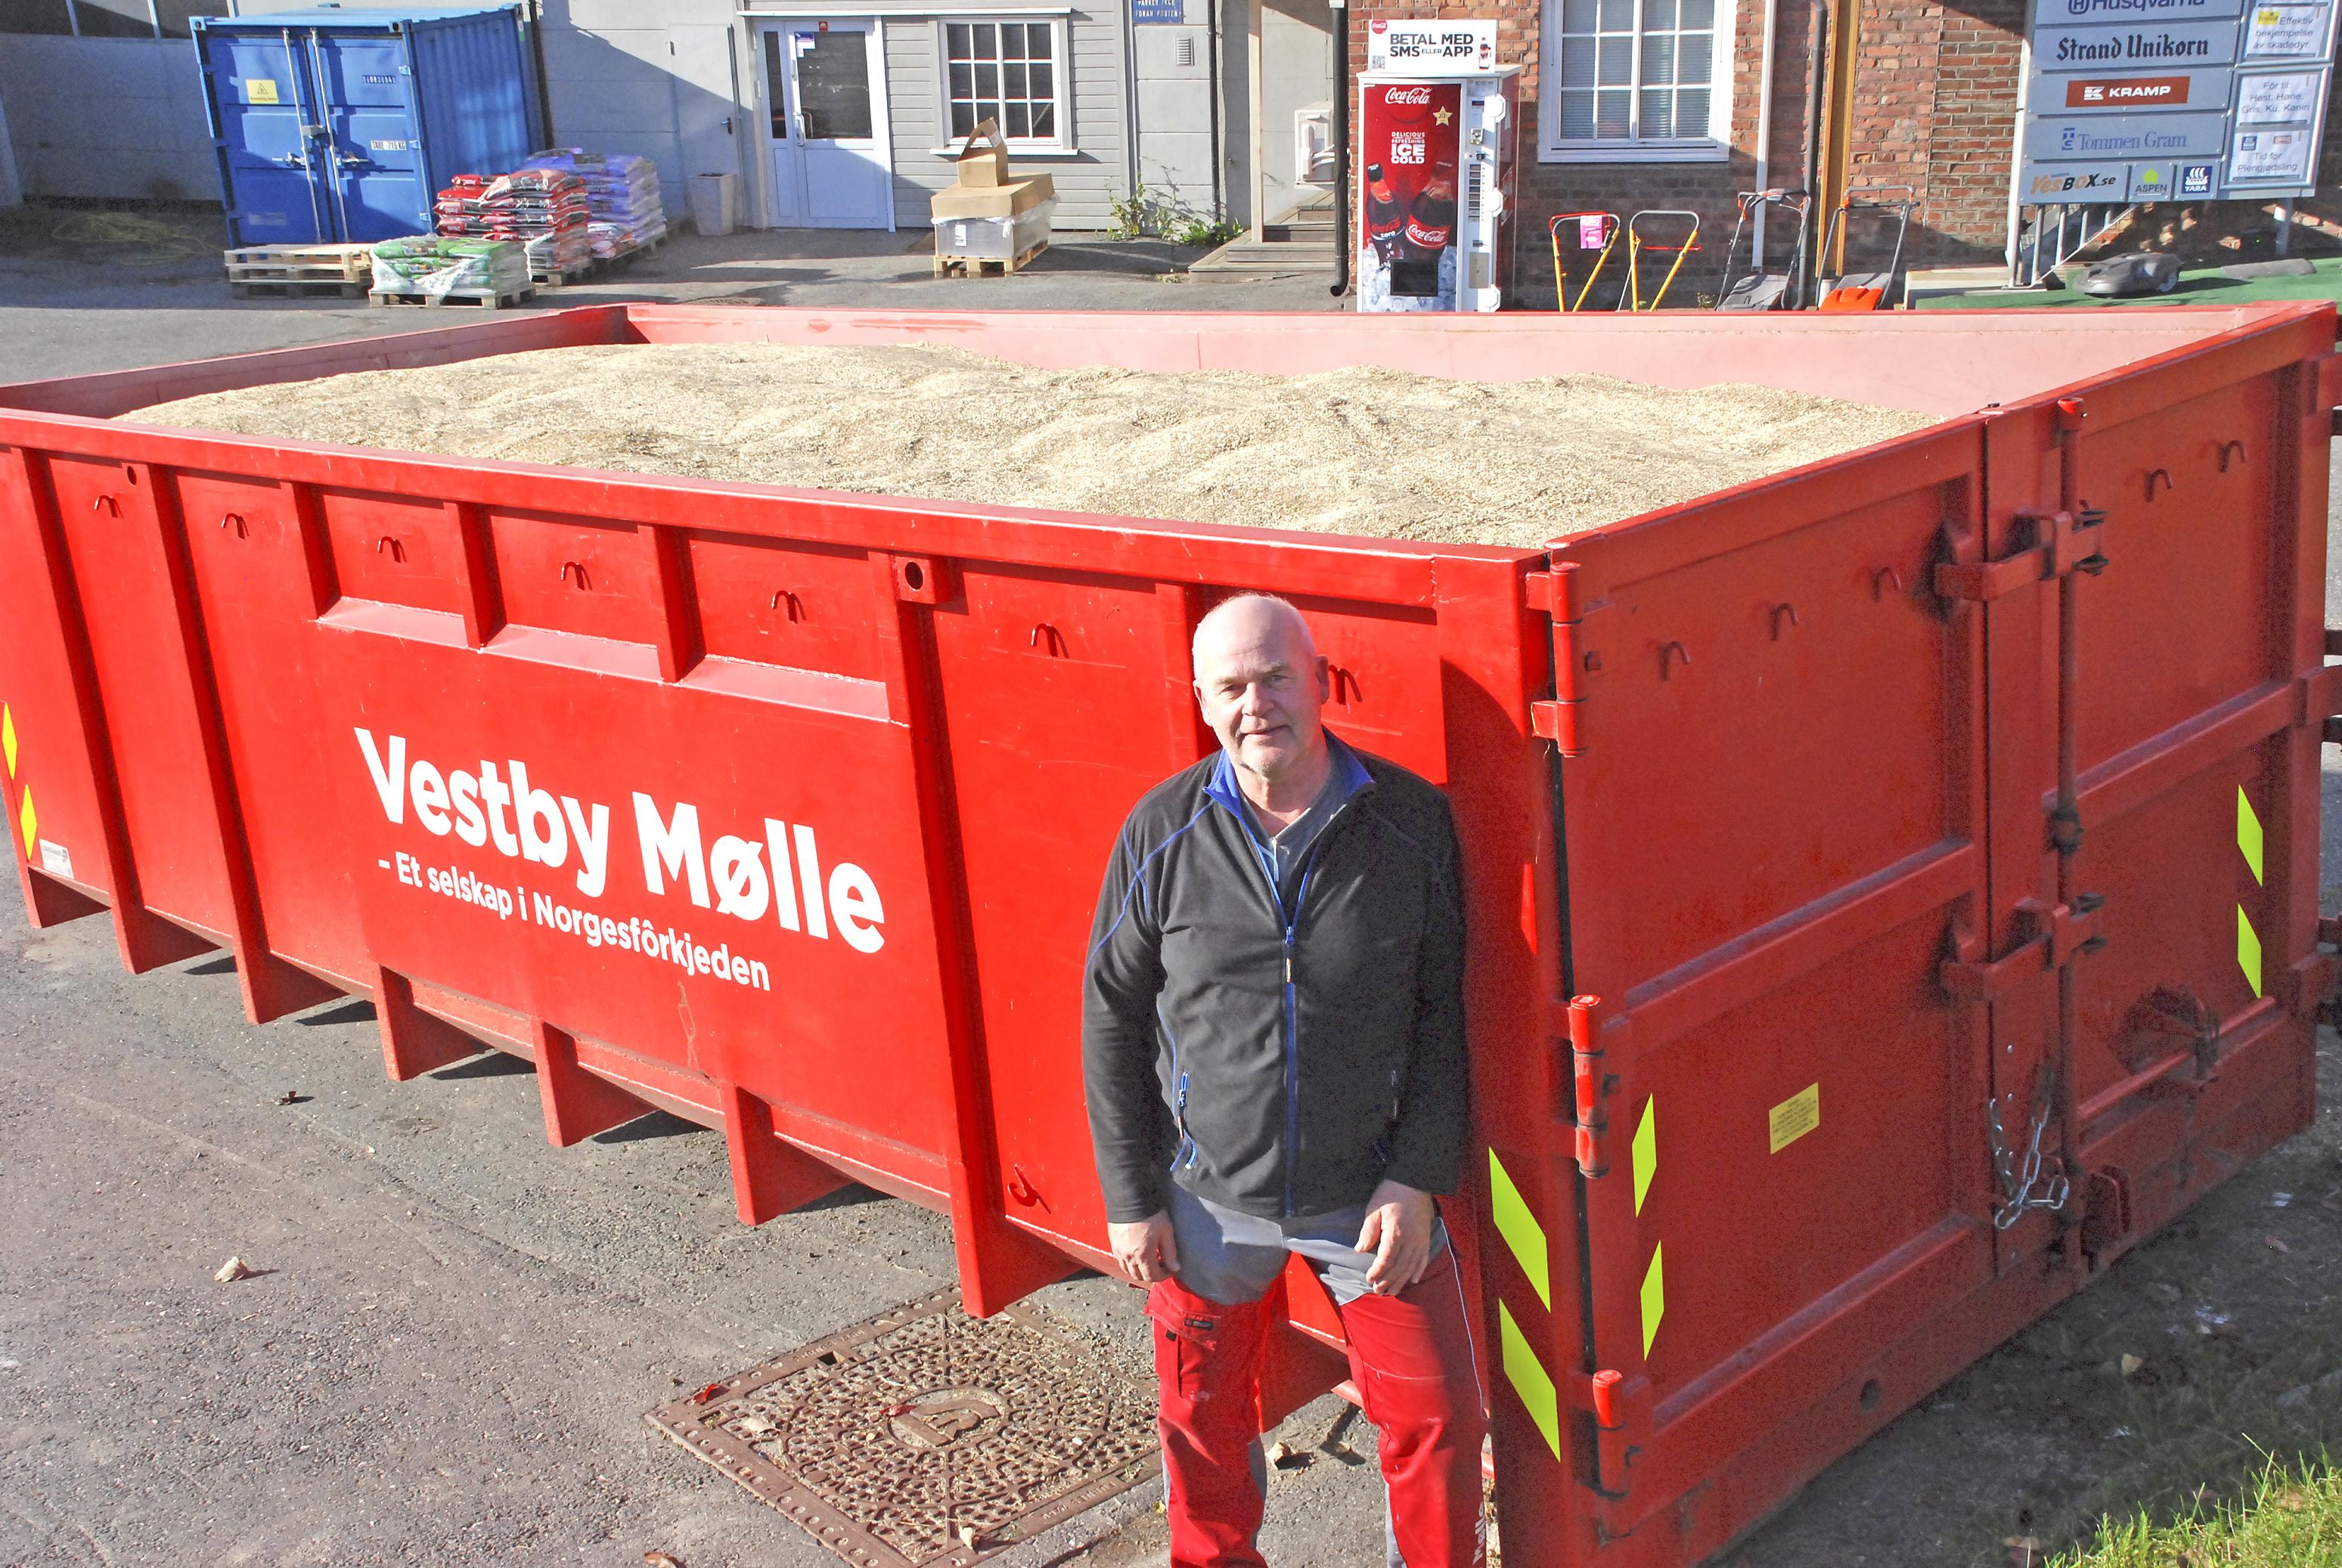 Mann står foran rød kontainer med korn. Det står Vestby Mølle på kontaineren.